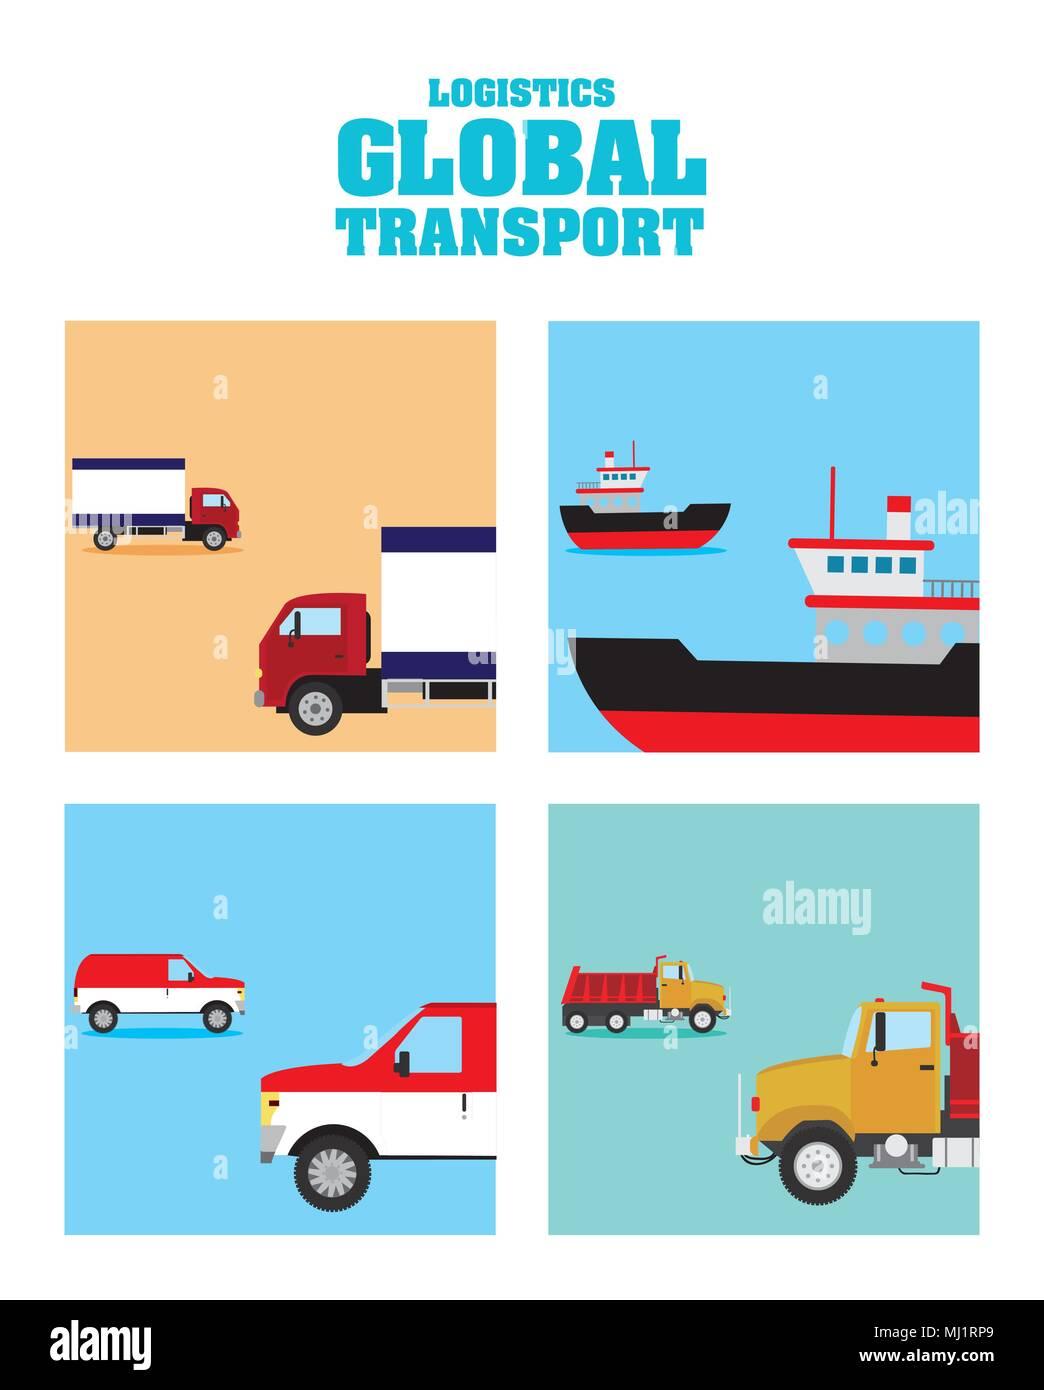 Logistic global transport concept - Stock Image